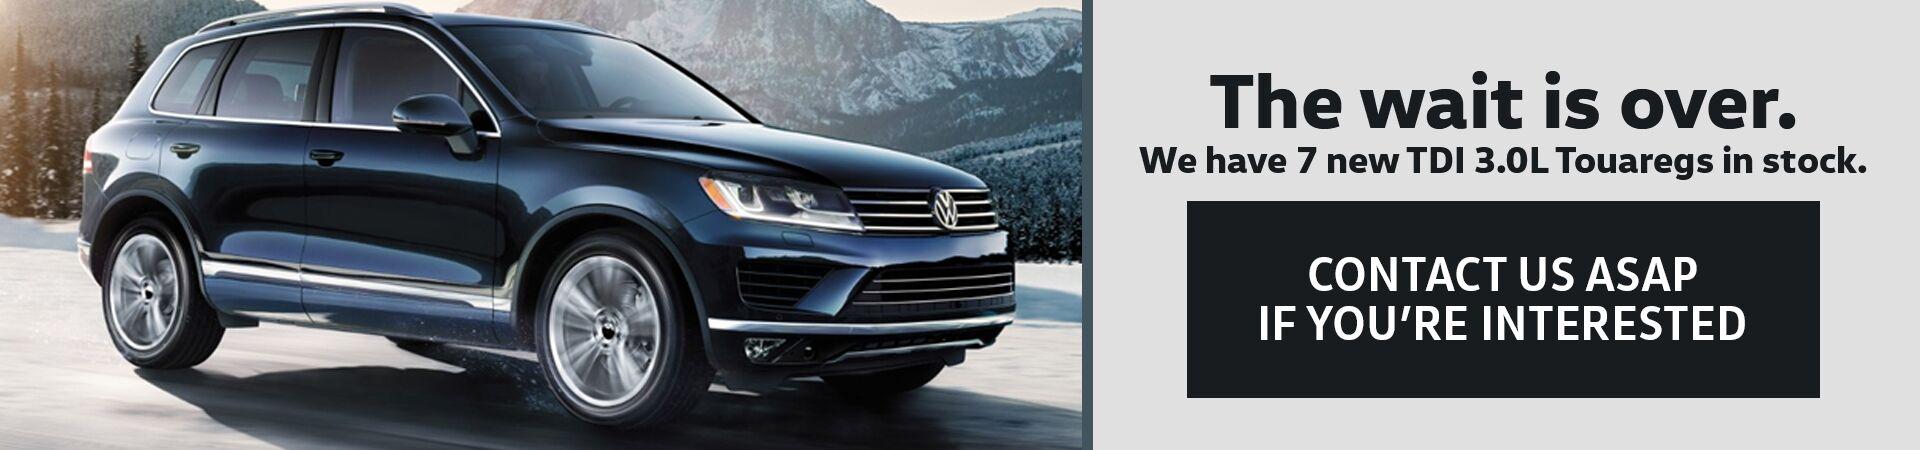 Phoenix AZ VW Dealer | San Tan Volkswagen | Serving Chandler, Mesa, Tempe & Gilbert, Arizona